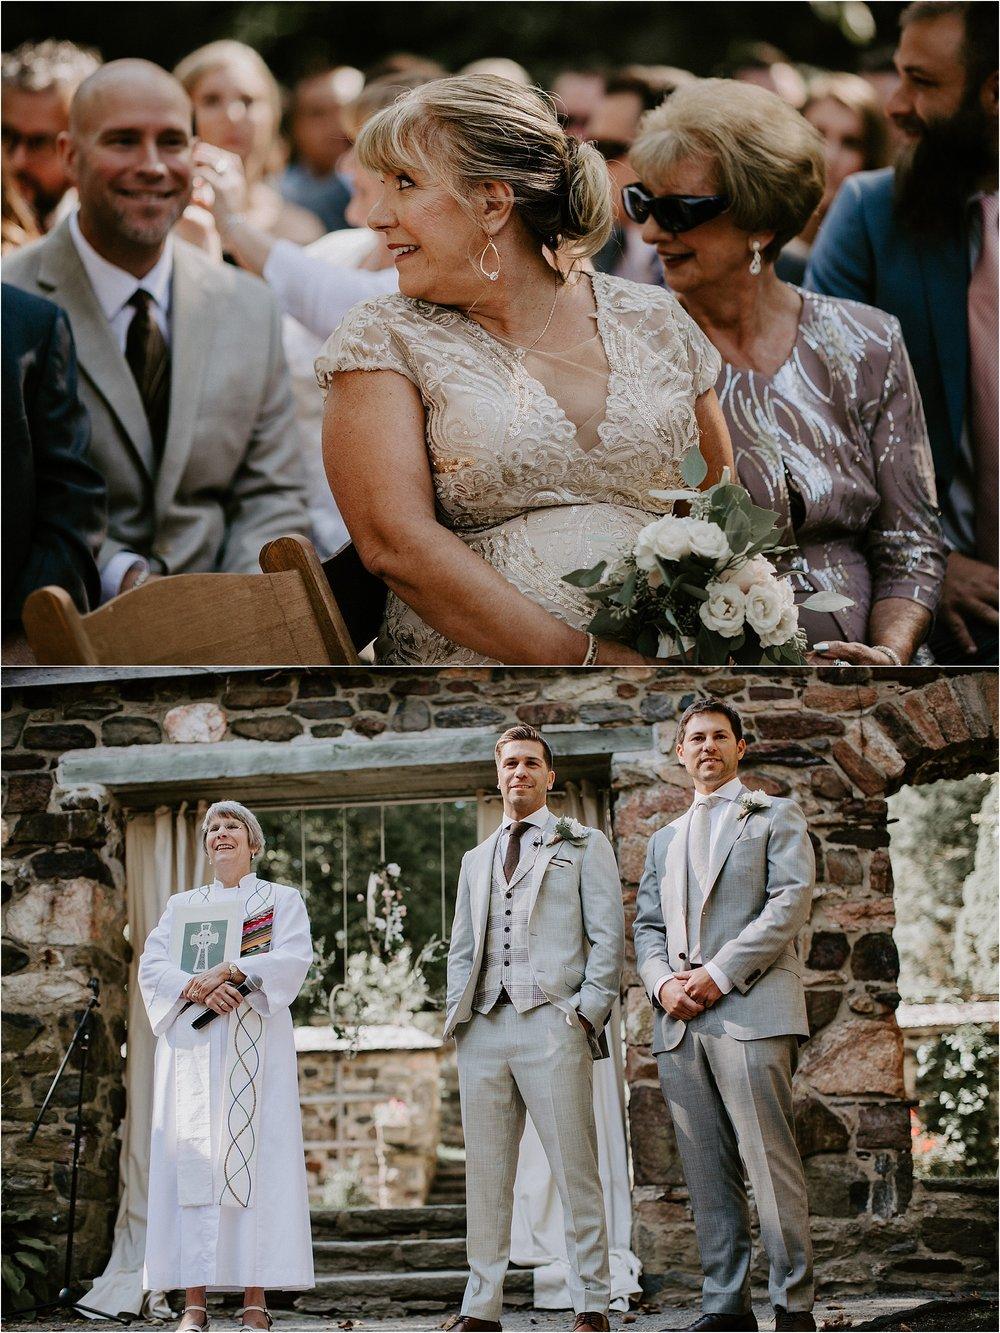 Sarah_Brookhart_Philadelphia_Wedding_Photographer_0020.jpg